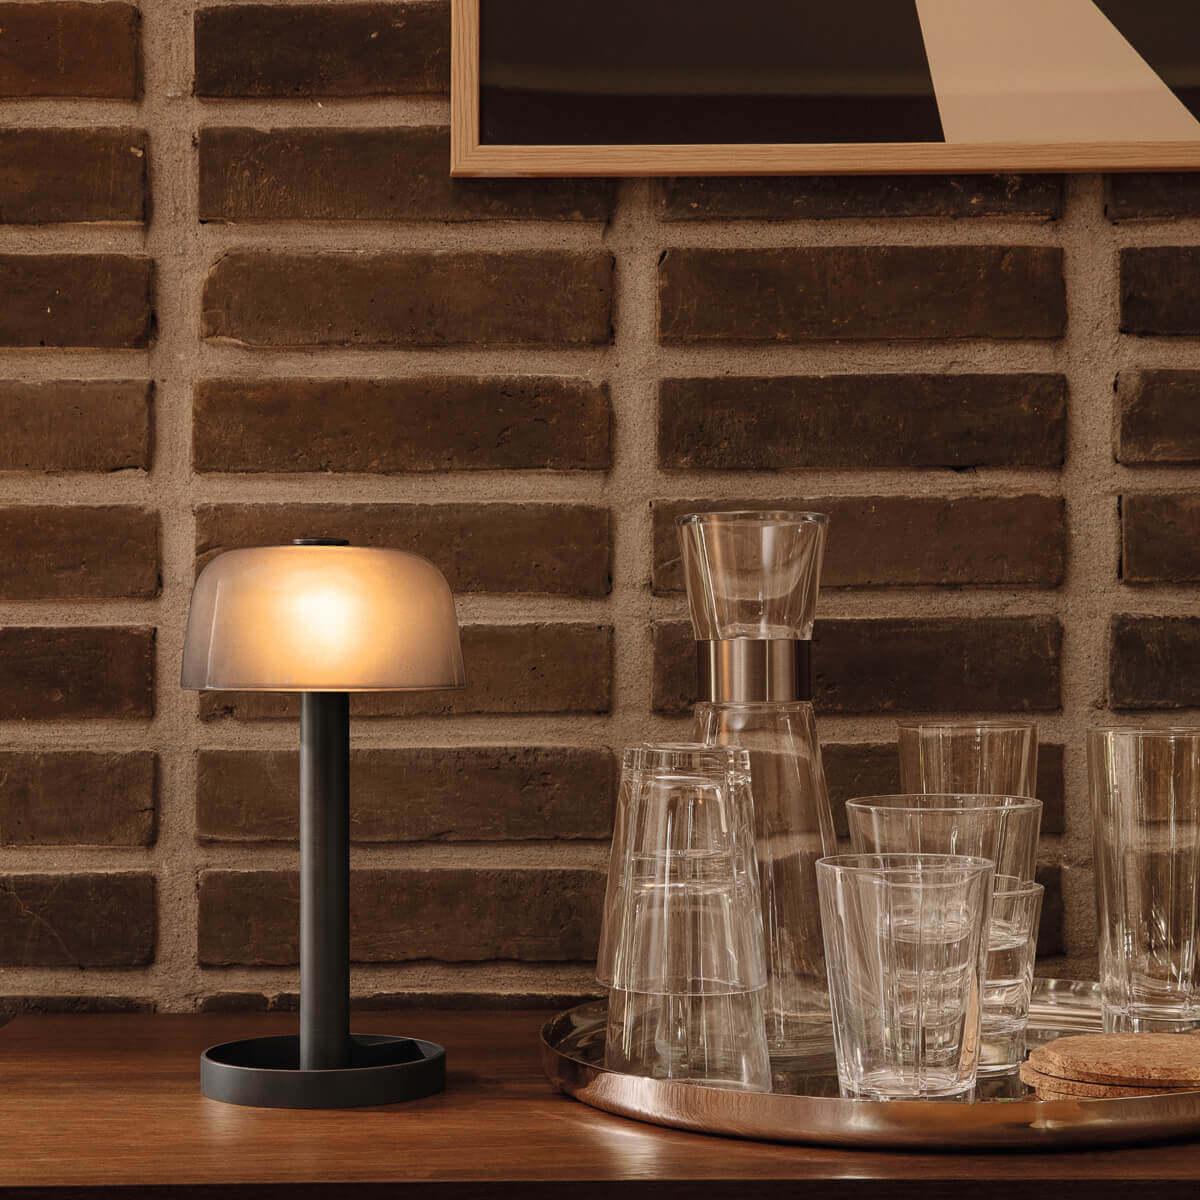 SOFTSPOT PORTABLE LAMP